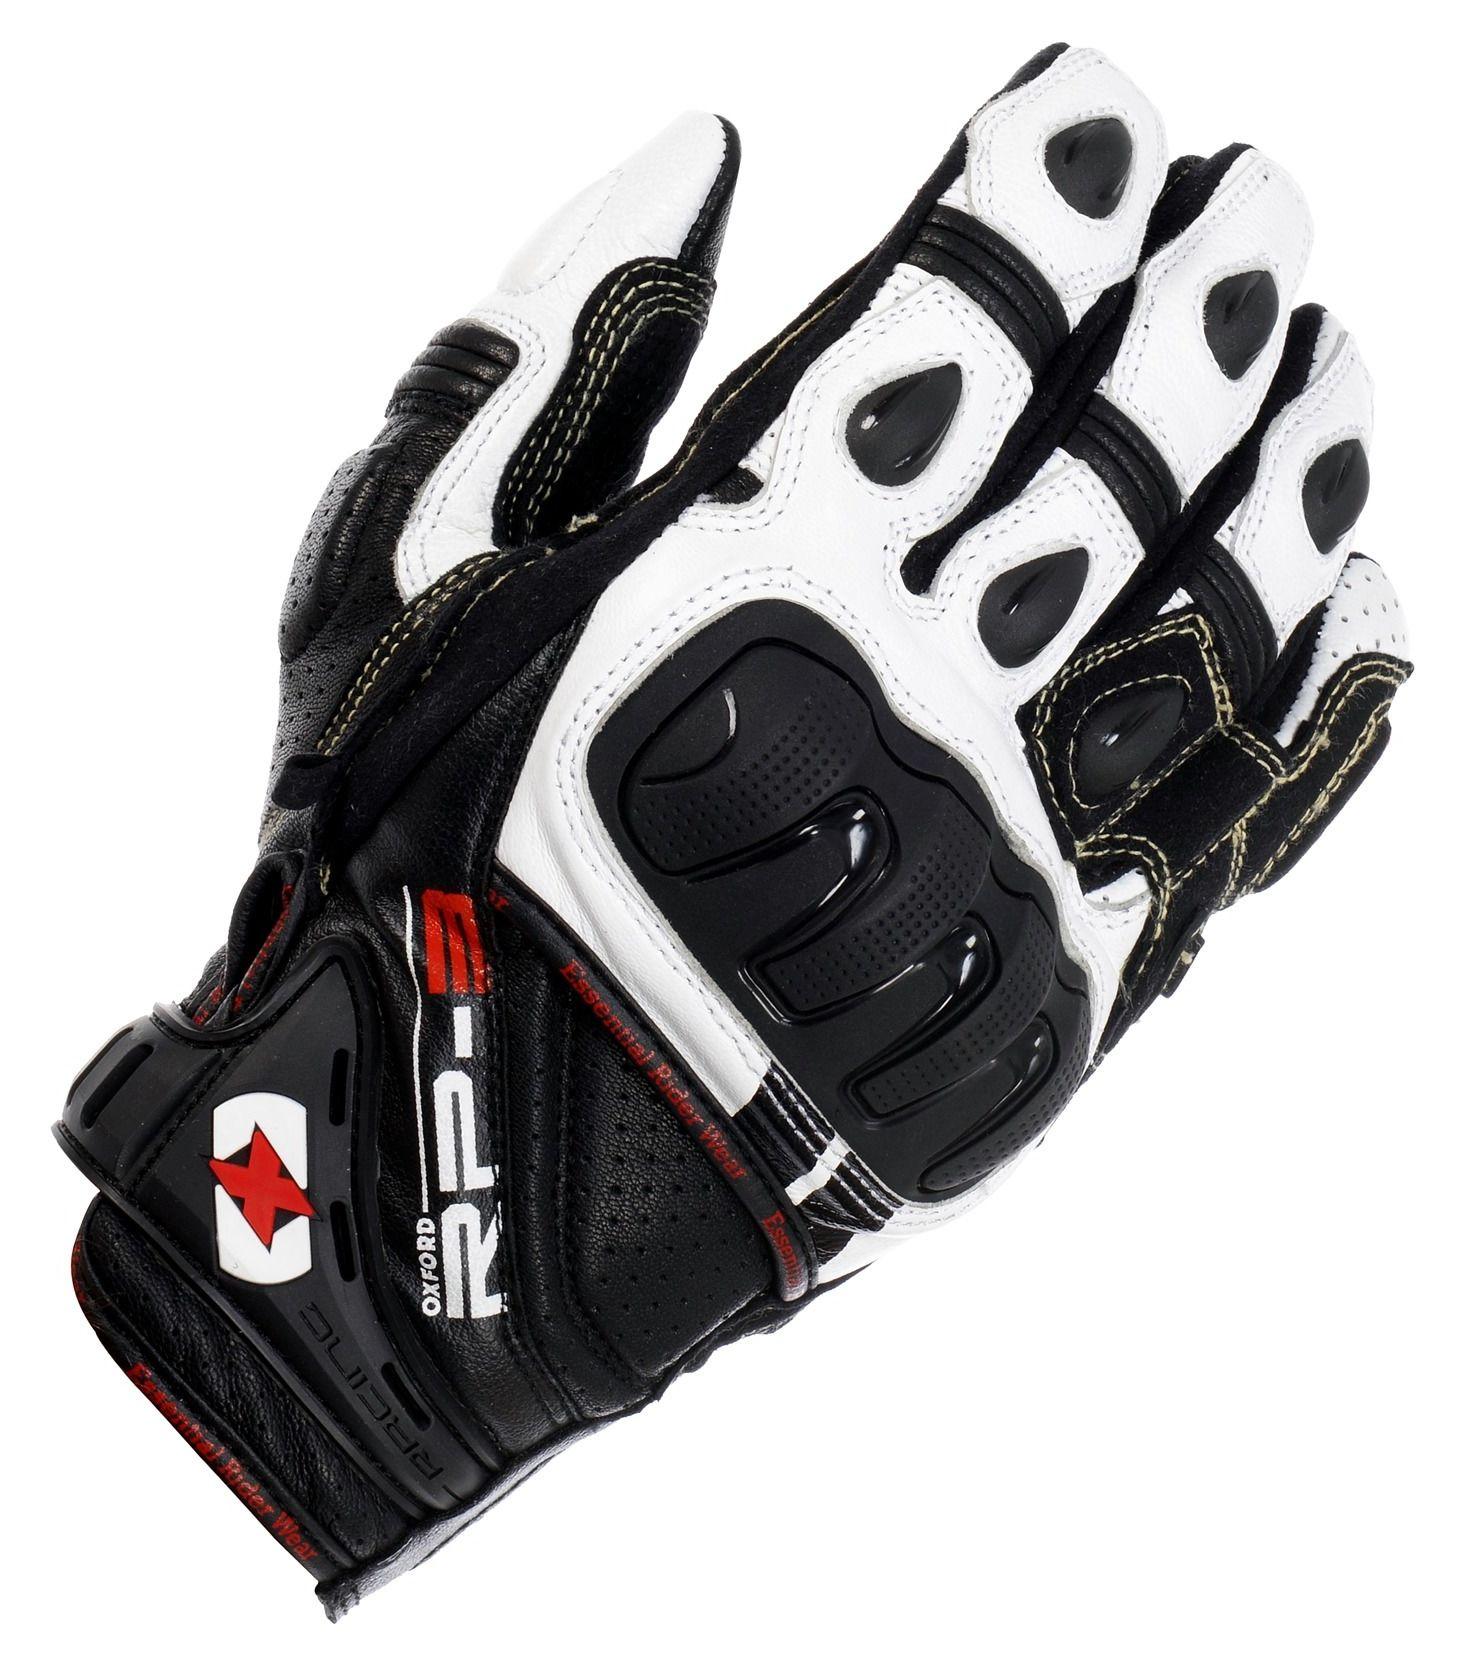 Motorcycle gloves external seams - Motorcycle Gloves External Seams 13